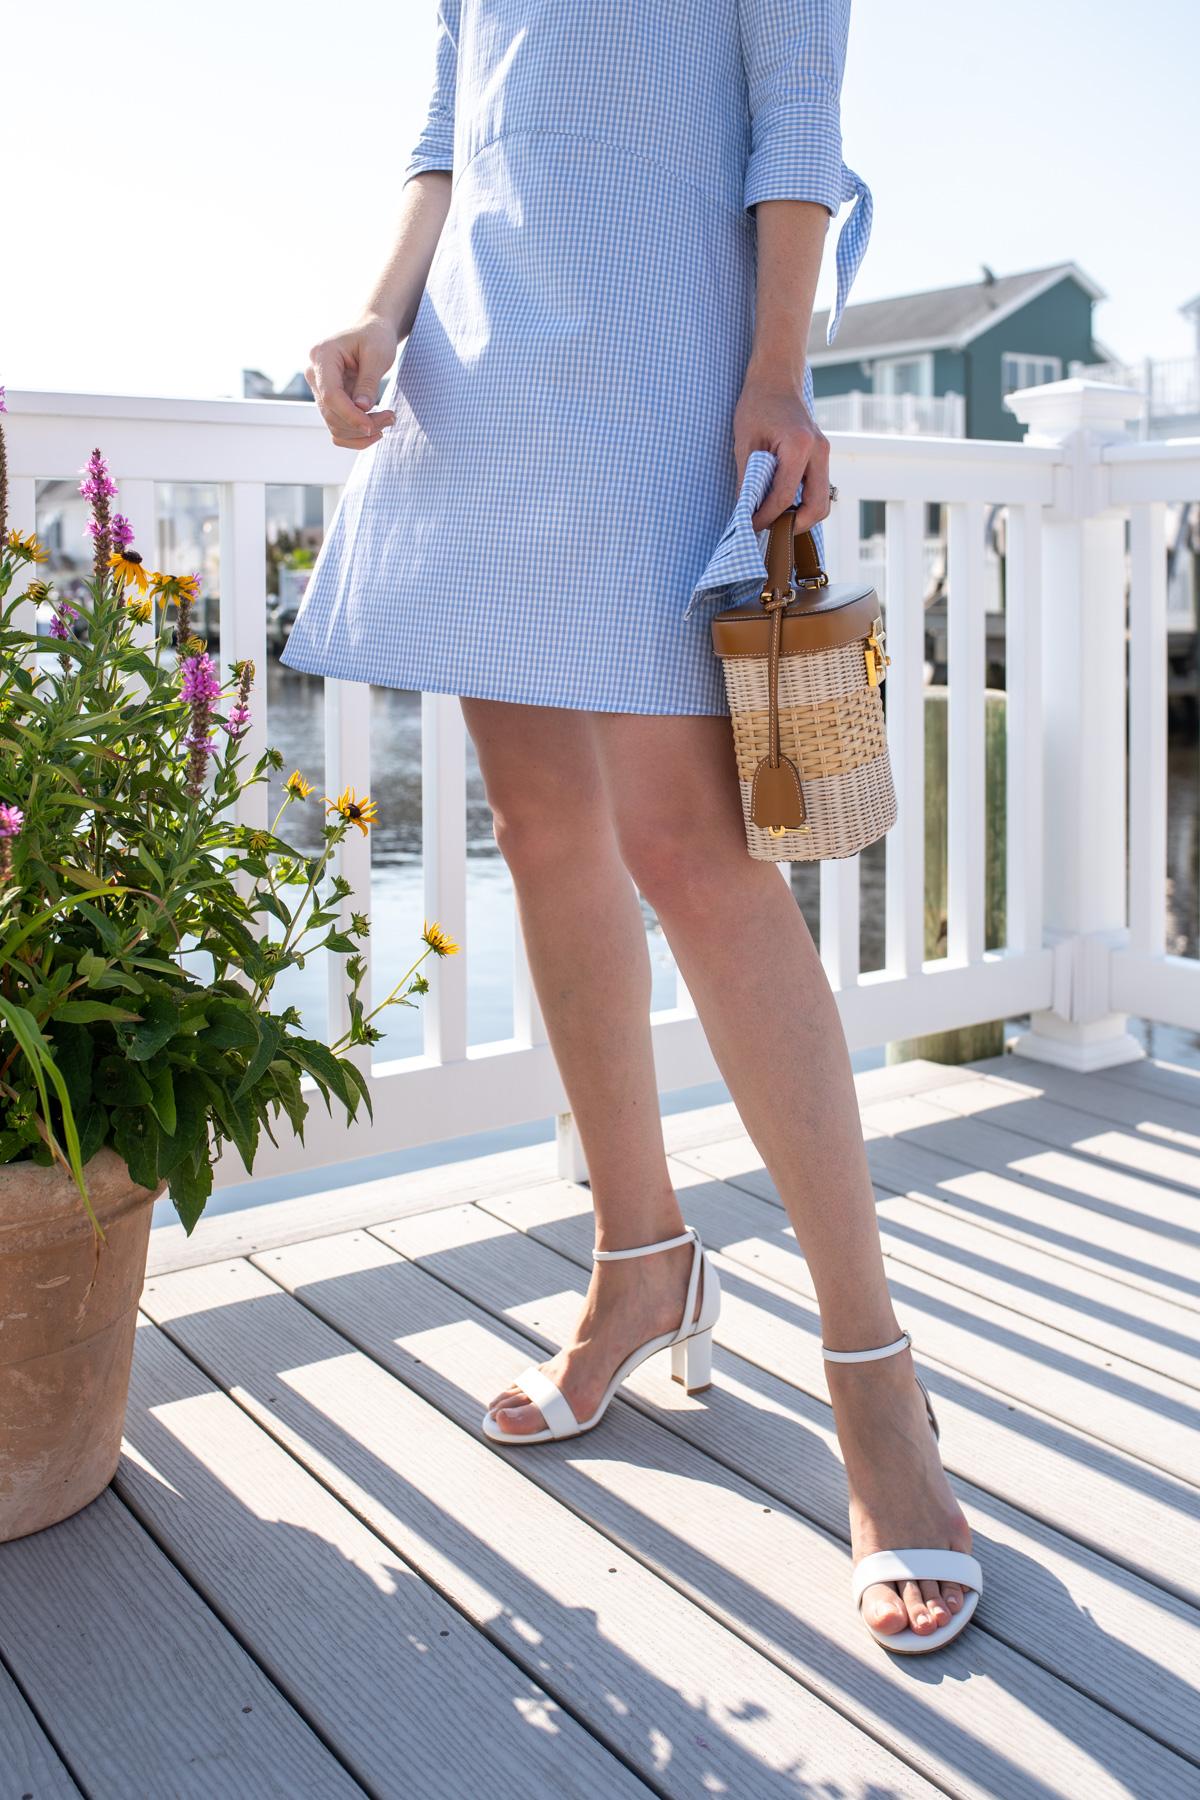 Stacie Flinner x Marta Scarampi Cotton Dress and Face mask-17.jpg